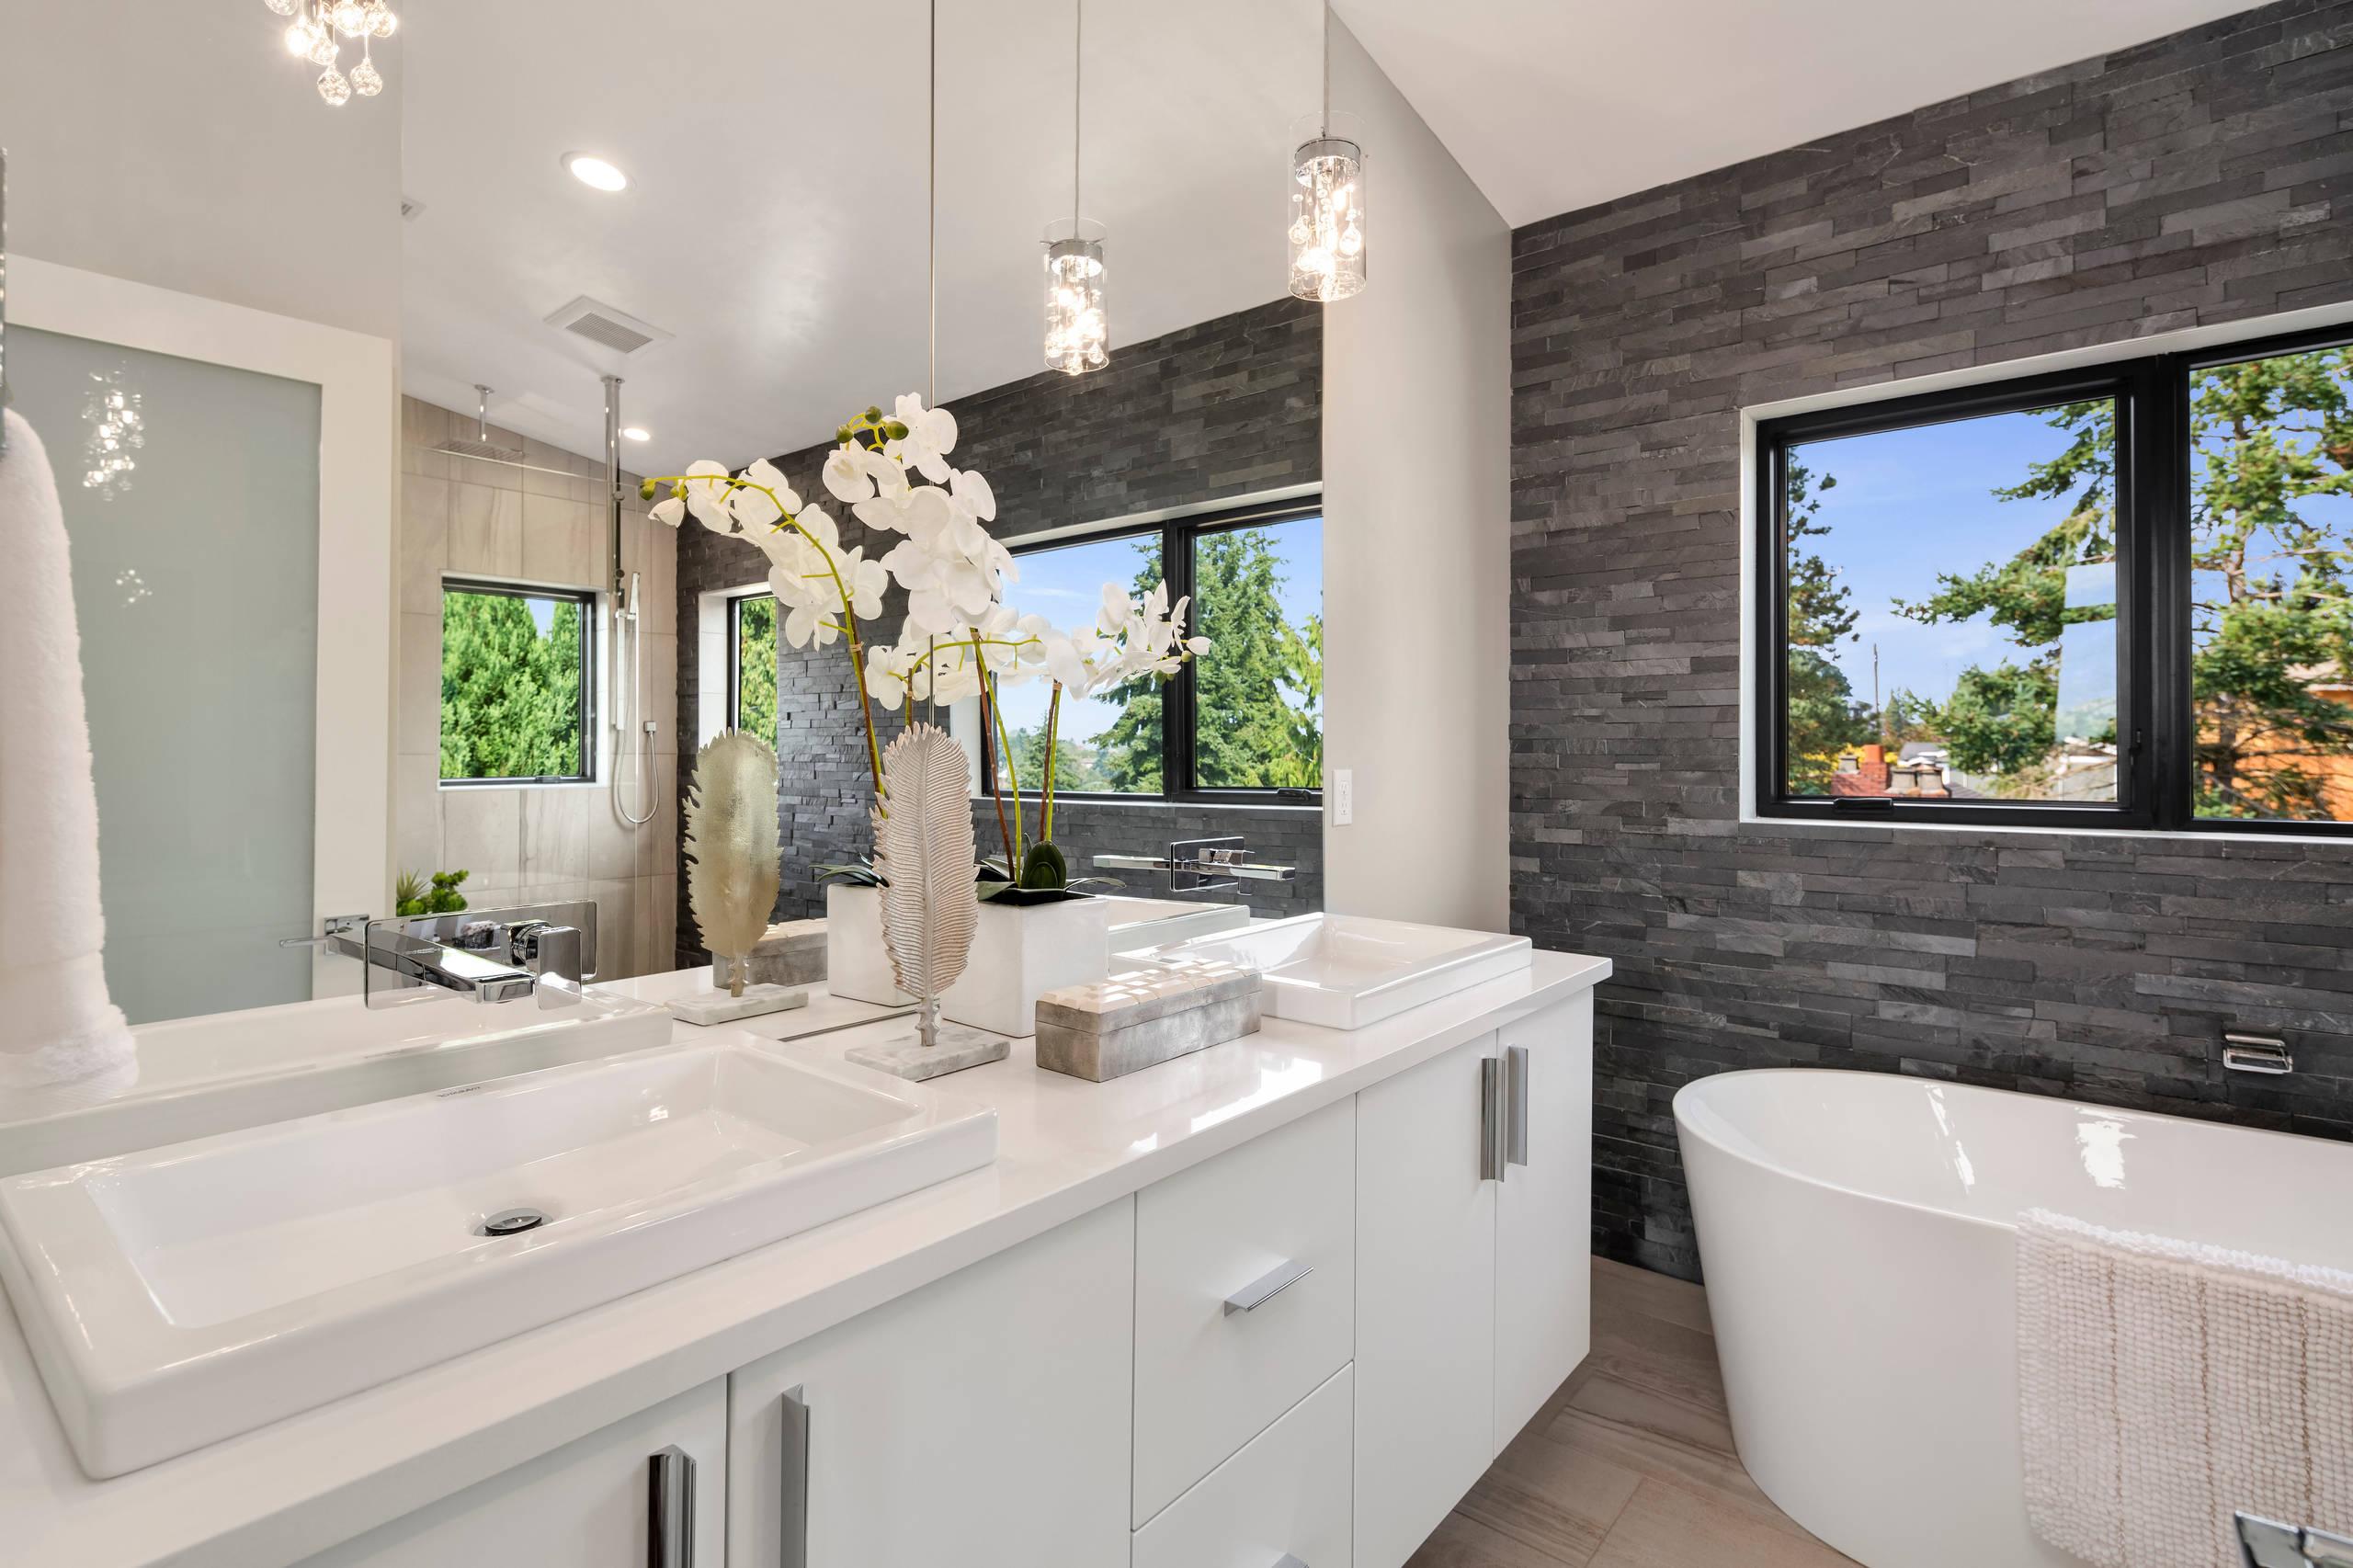 Magnolia Bathroom Ideas & Photos  Houzz